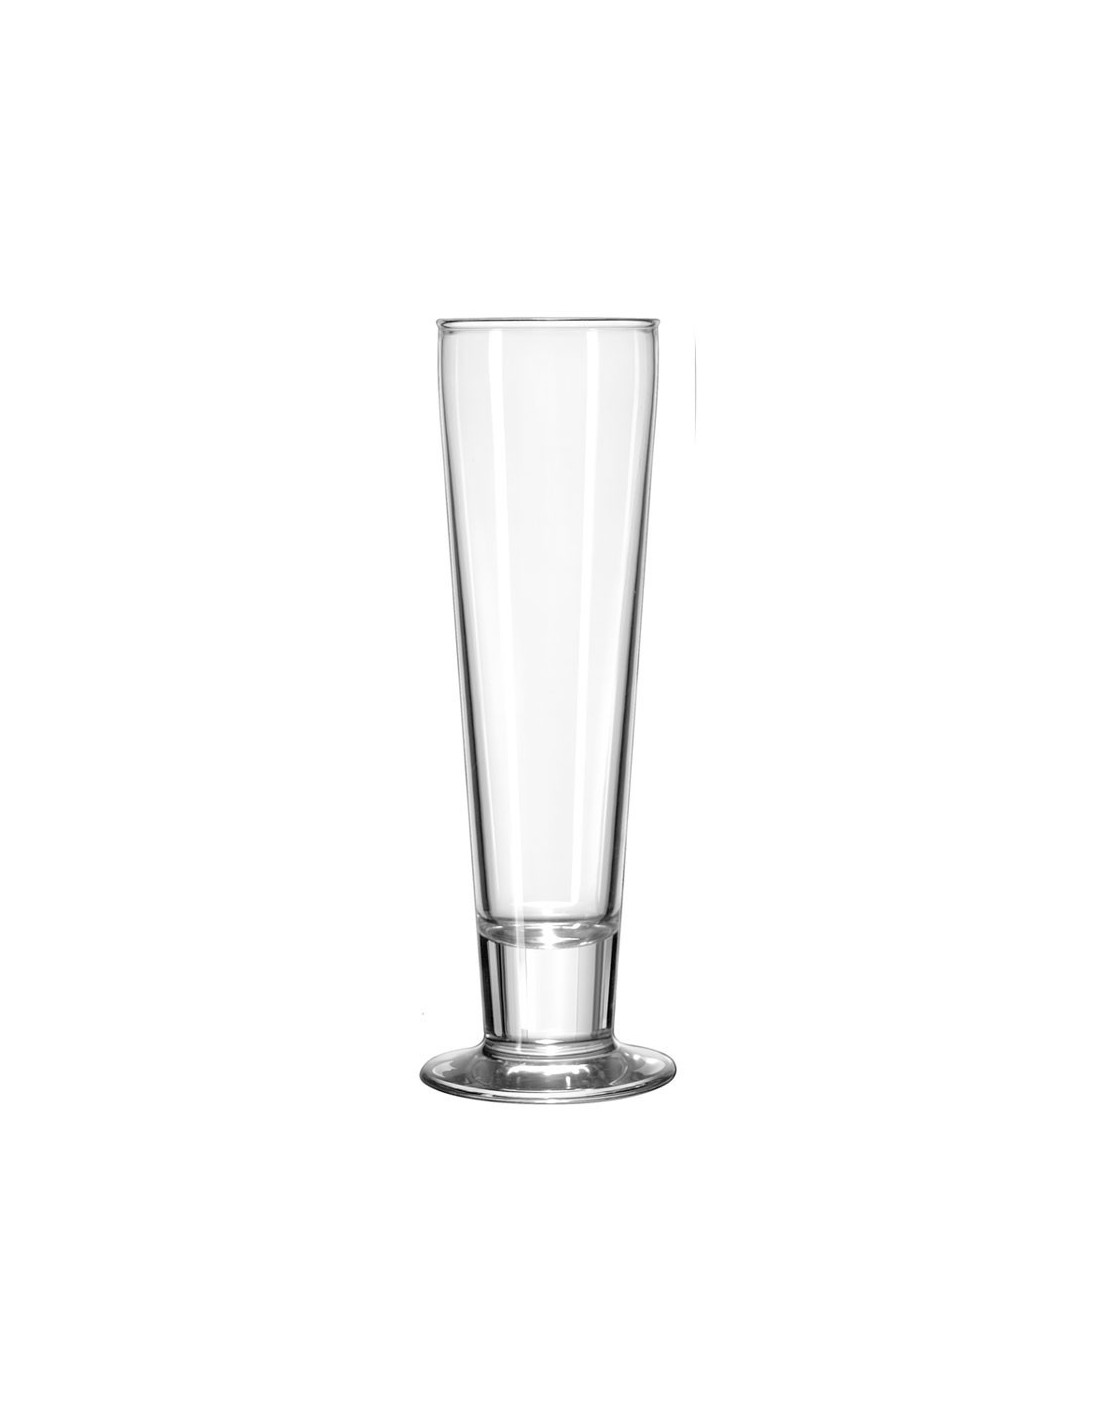 Copa cerveza libbey 3828 catalina pilsner 12 oz for Copa cerveza